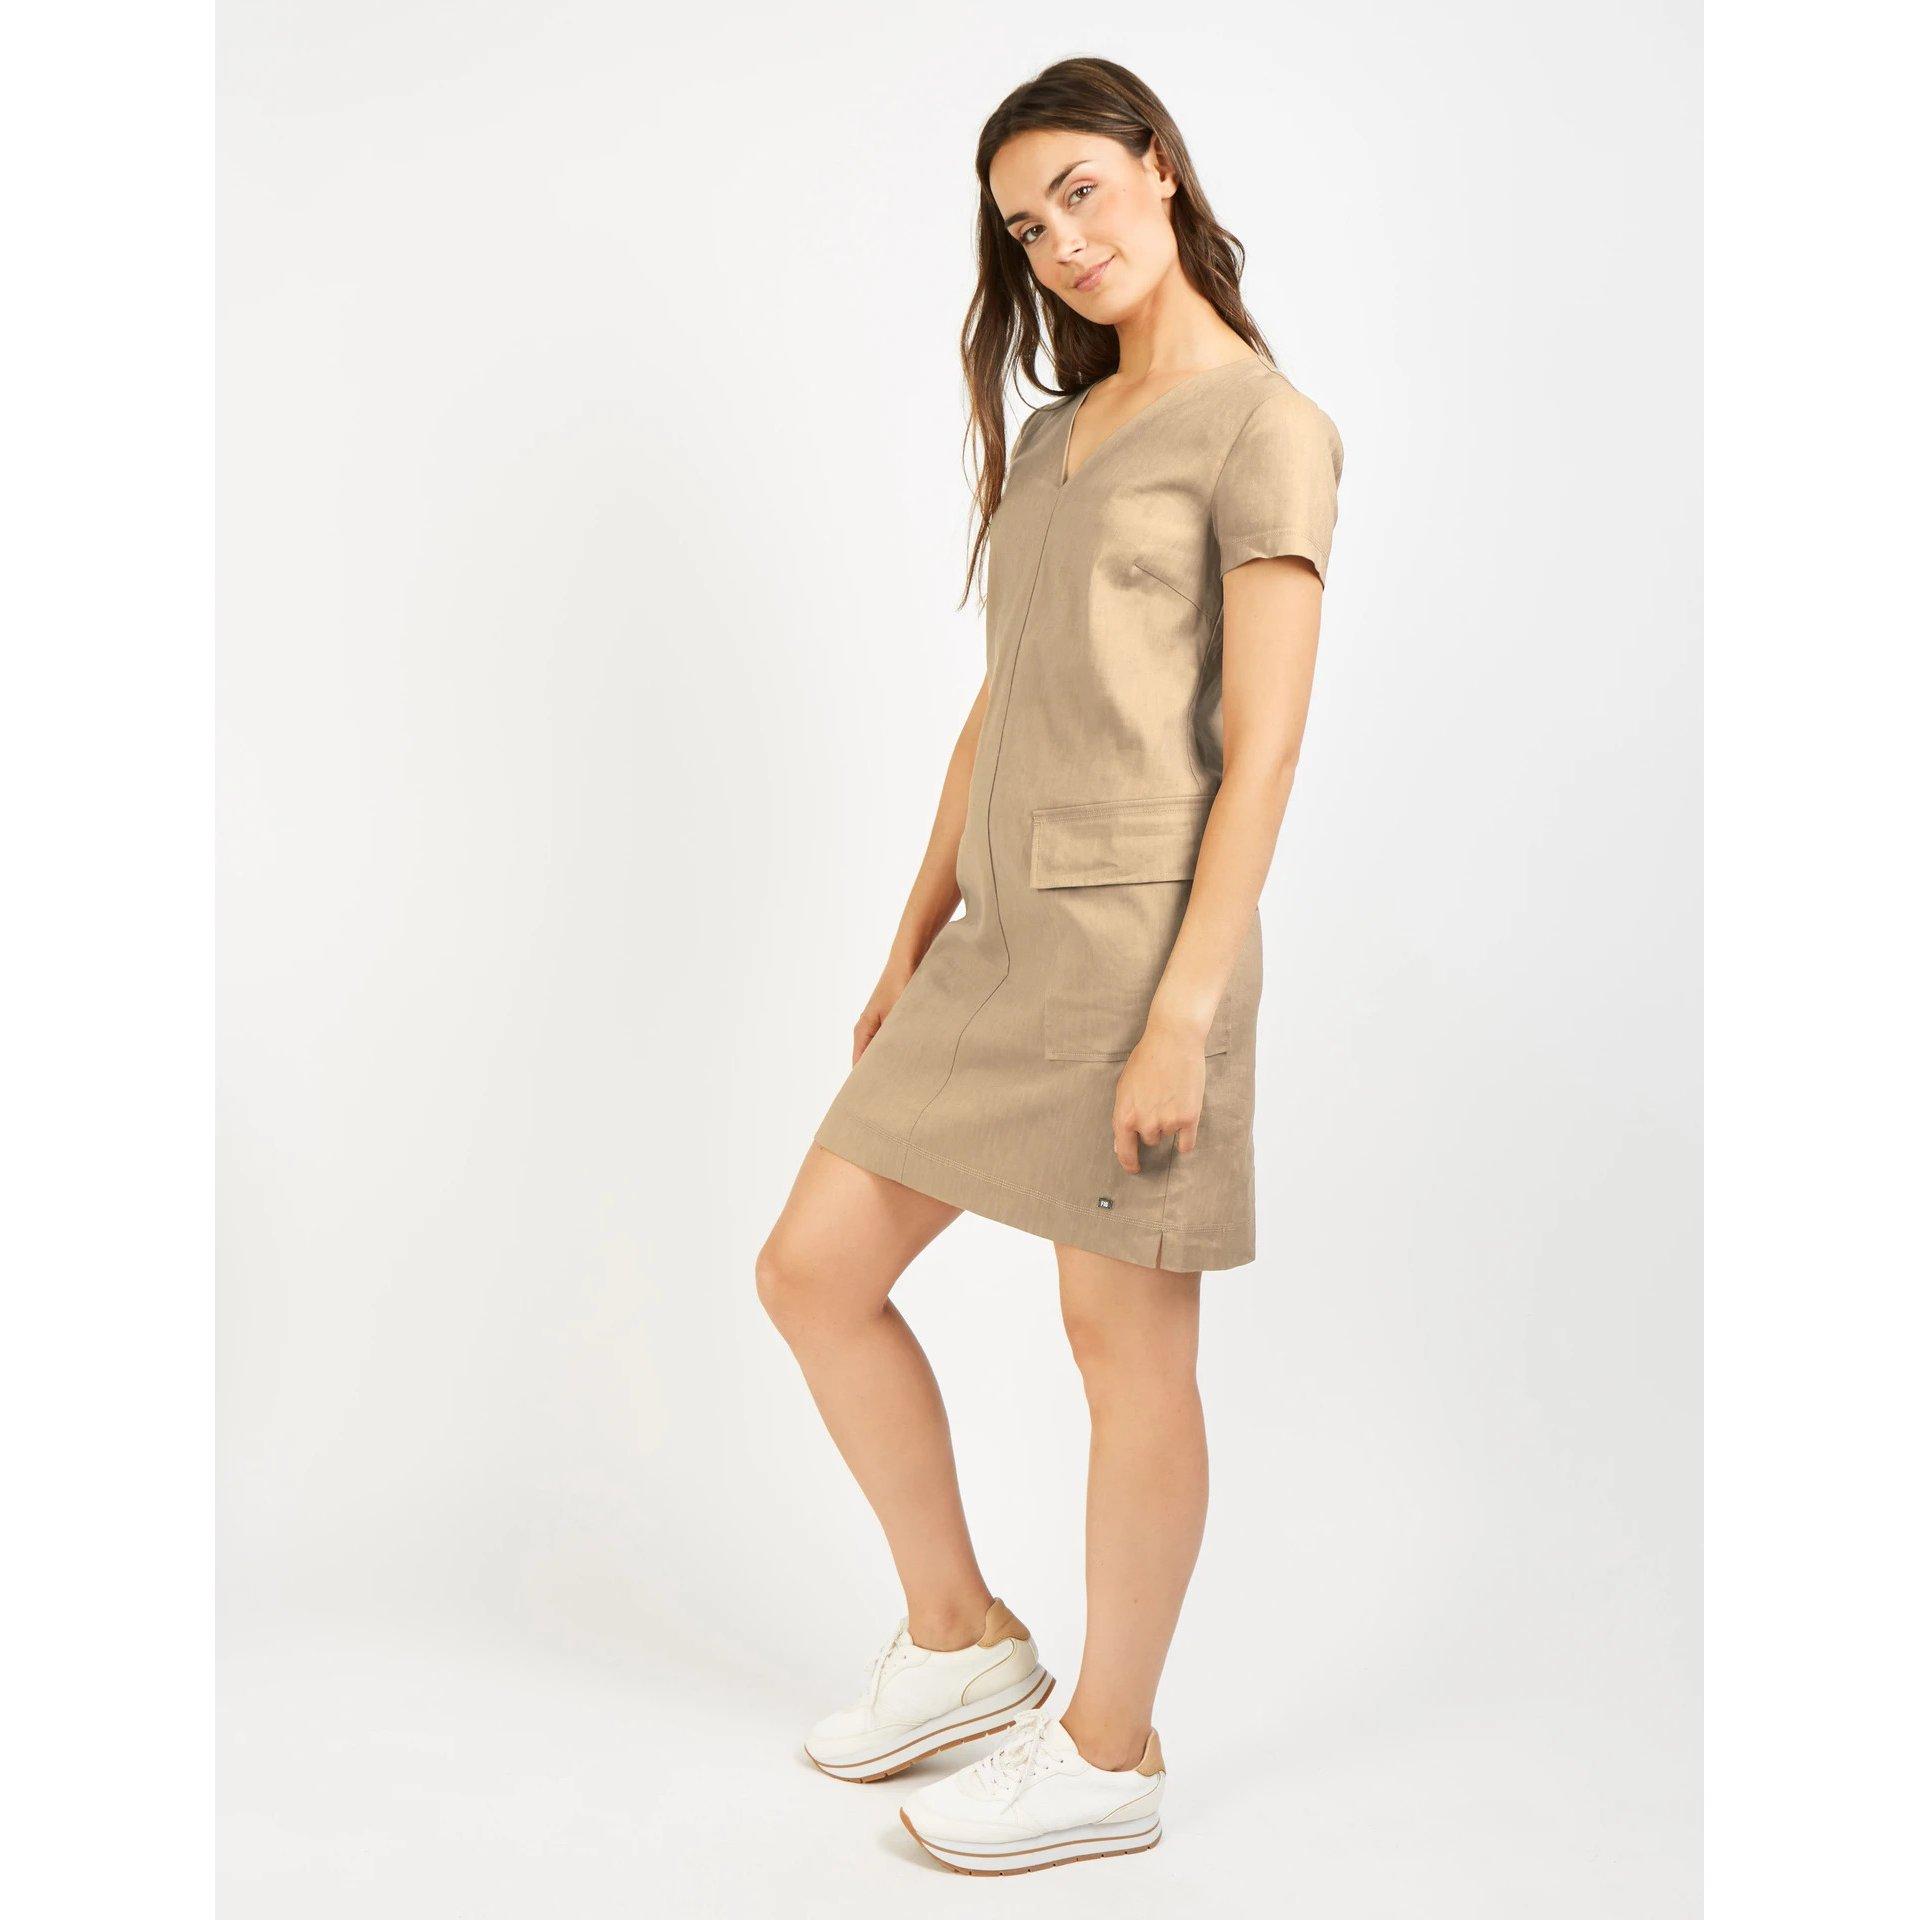 KARIJINI DRESS - WOMEN'S